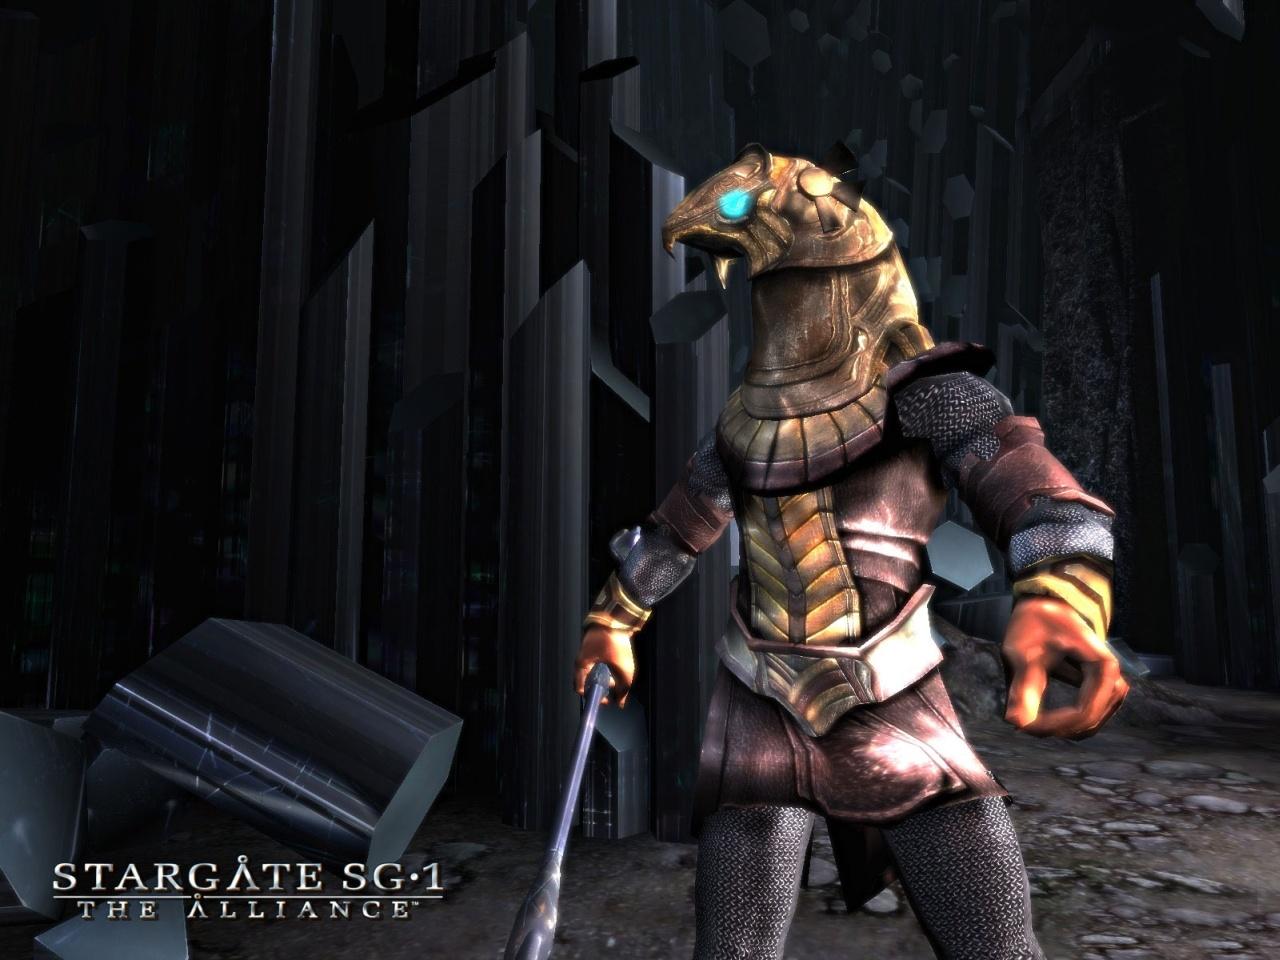 Games: Stargate SG-1: The Alliance - 011